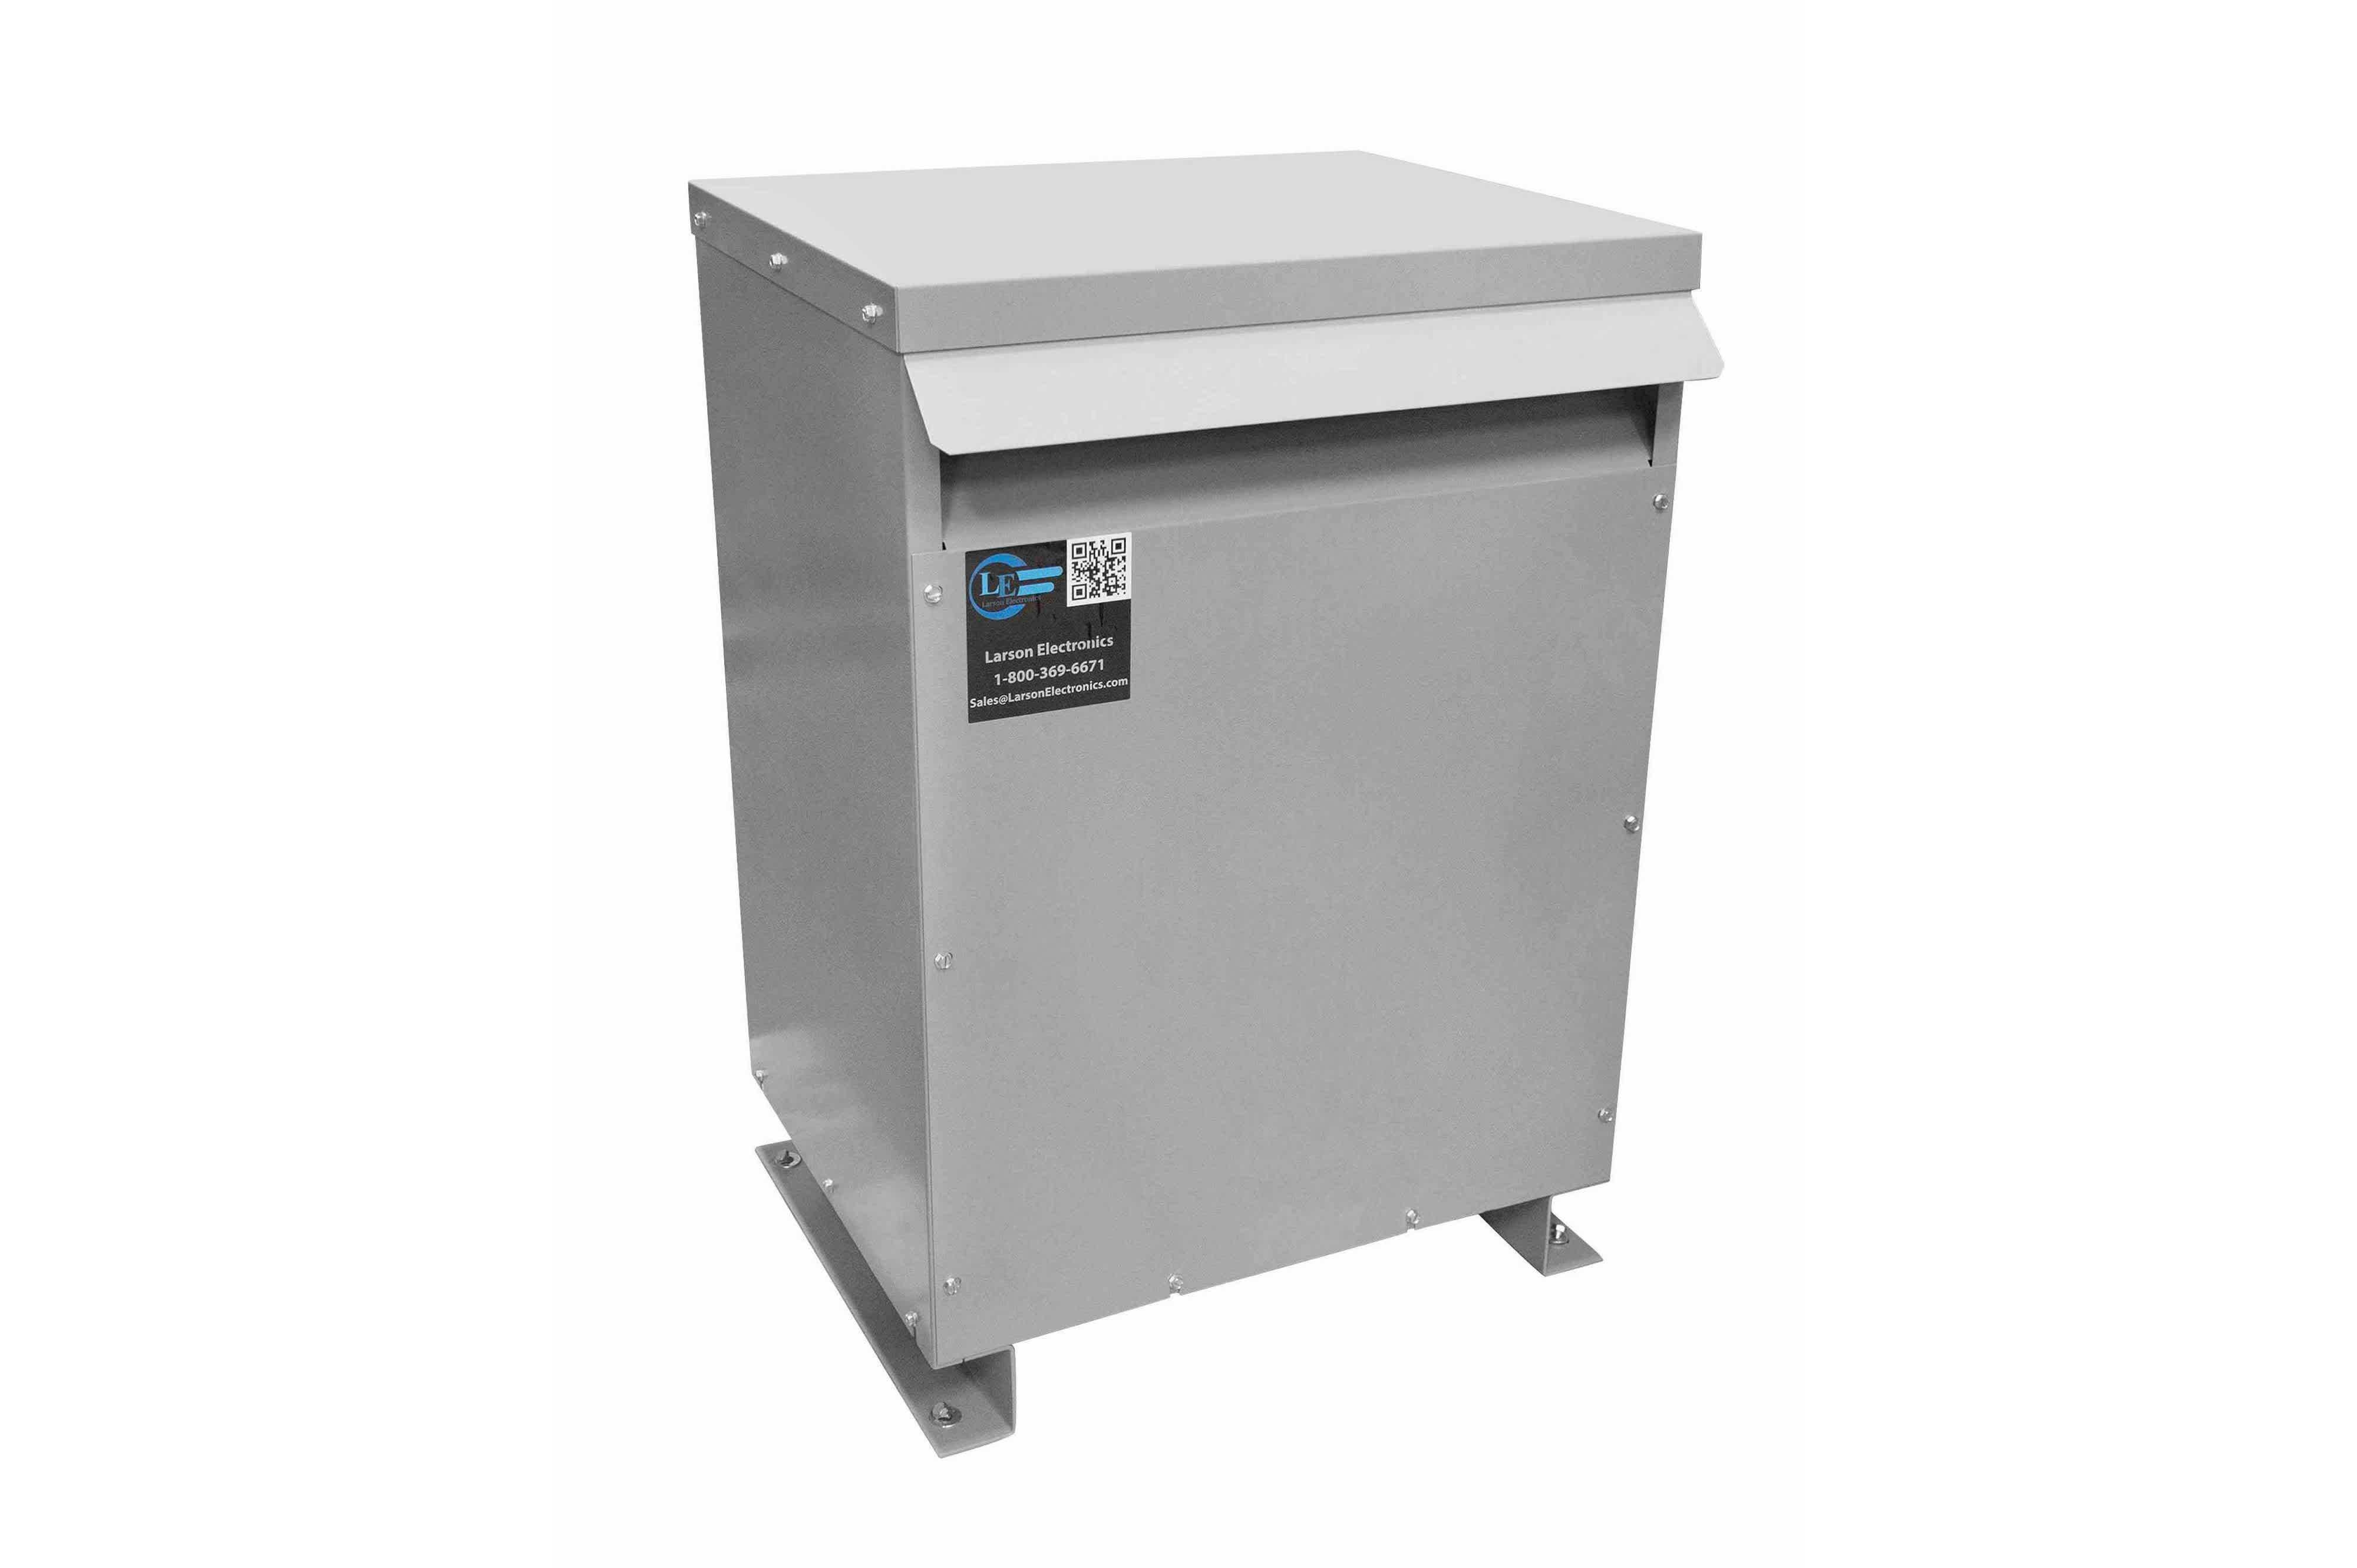 237.5 kVA 3PH Isolation Transformer, 480V Wye Primary, 480V Delta Secondary, N3R, Ventilated, 60 Hz